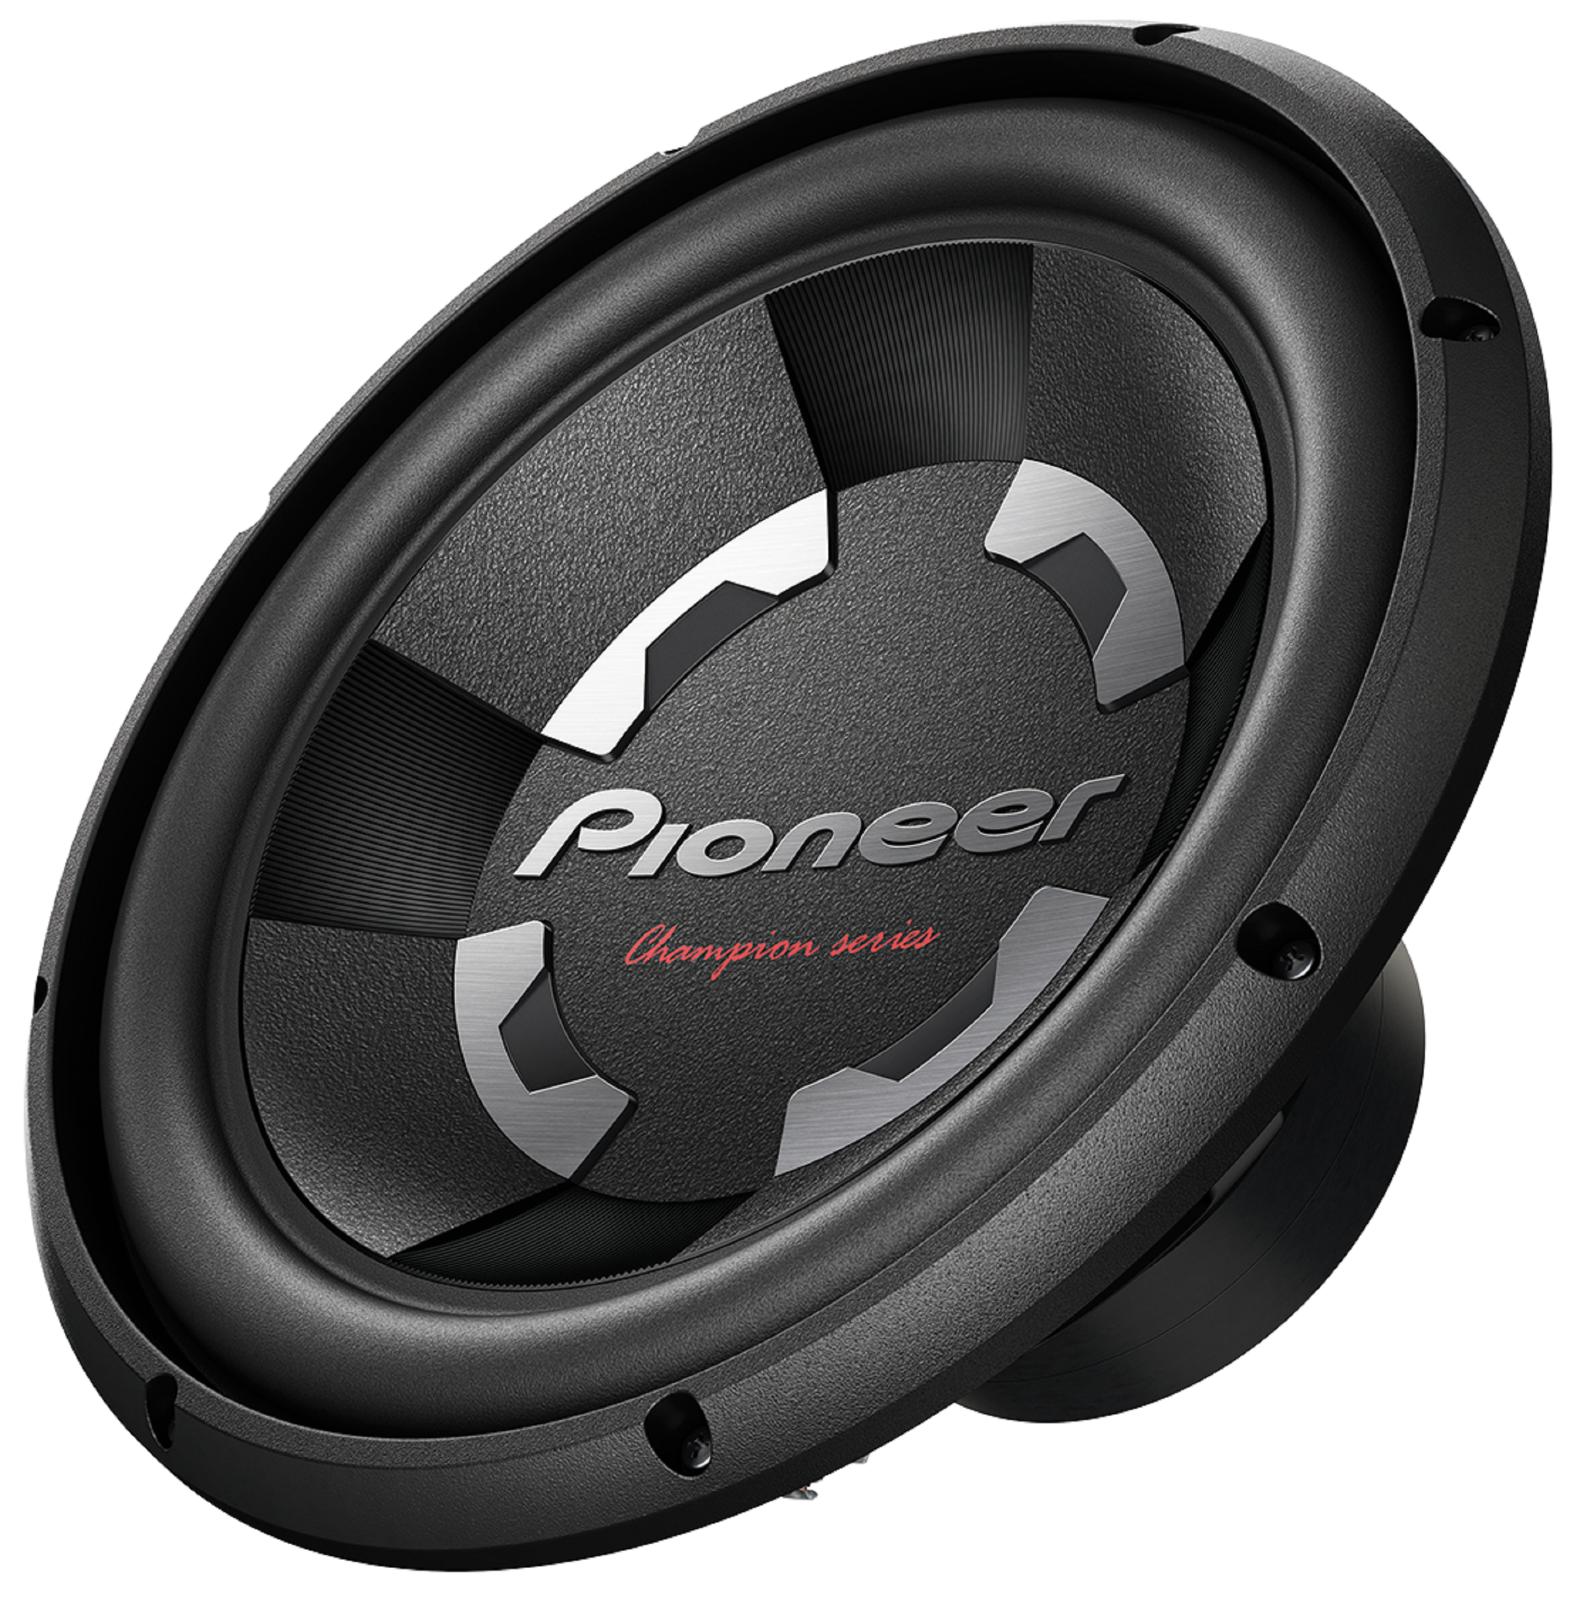 "PIONEER TS-300D4 12"" 1400W 4-OHM DVC CAR AUDIO STEREO SUBWOO"